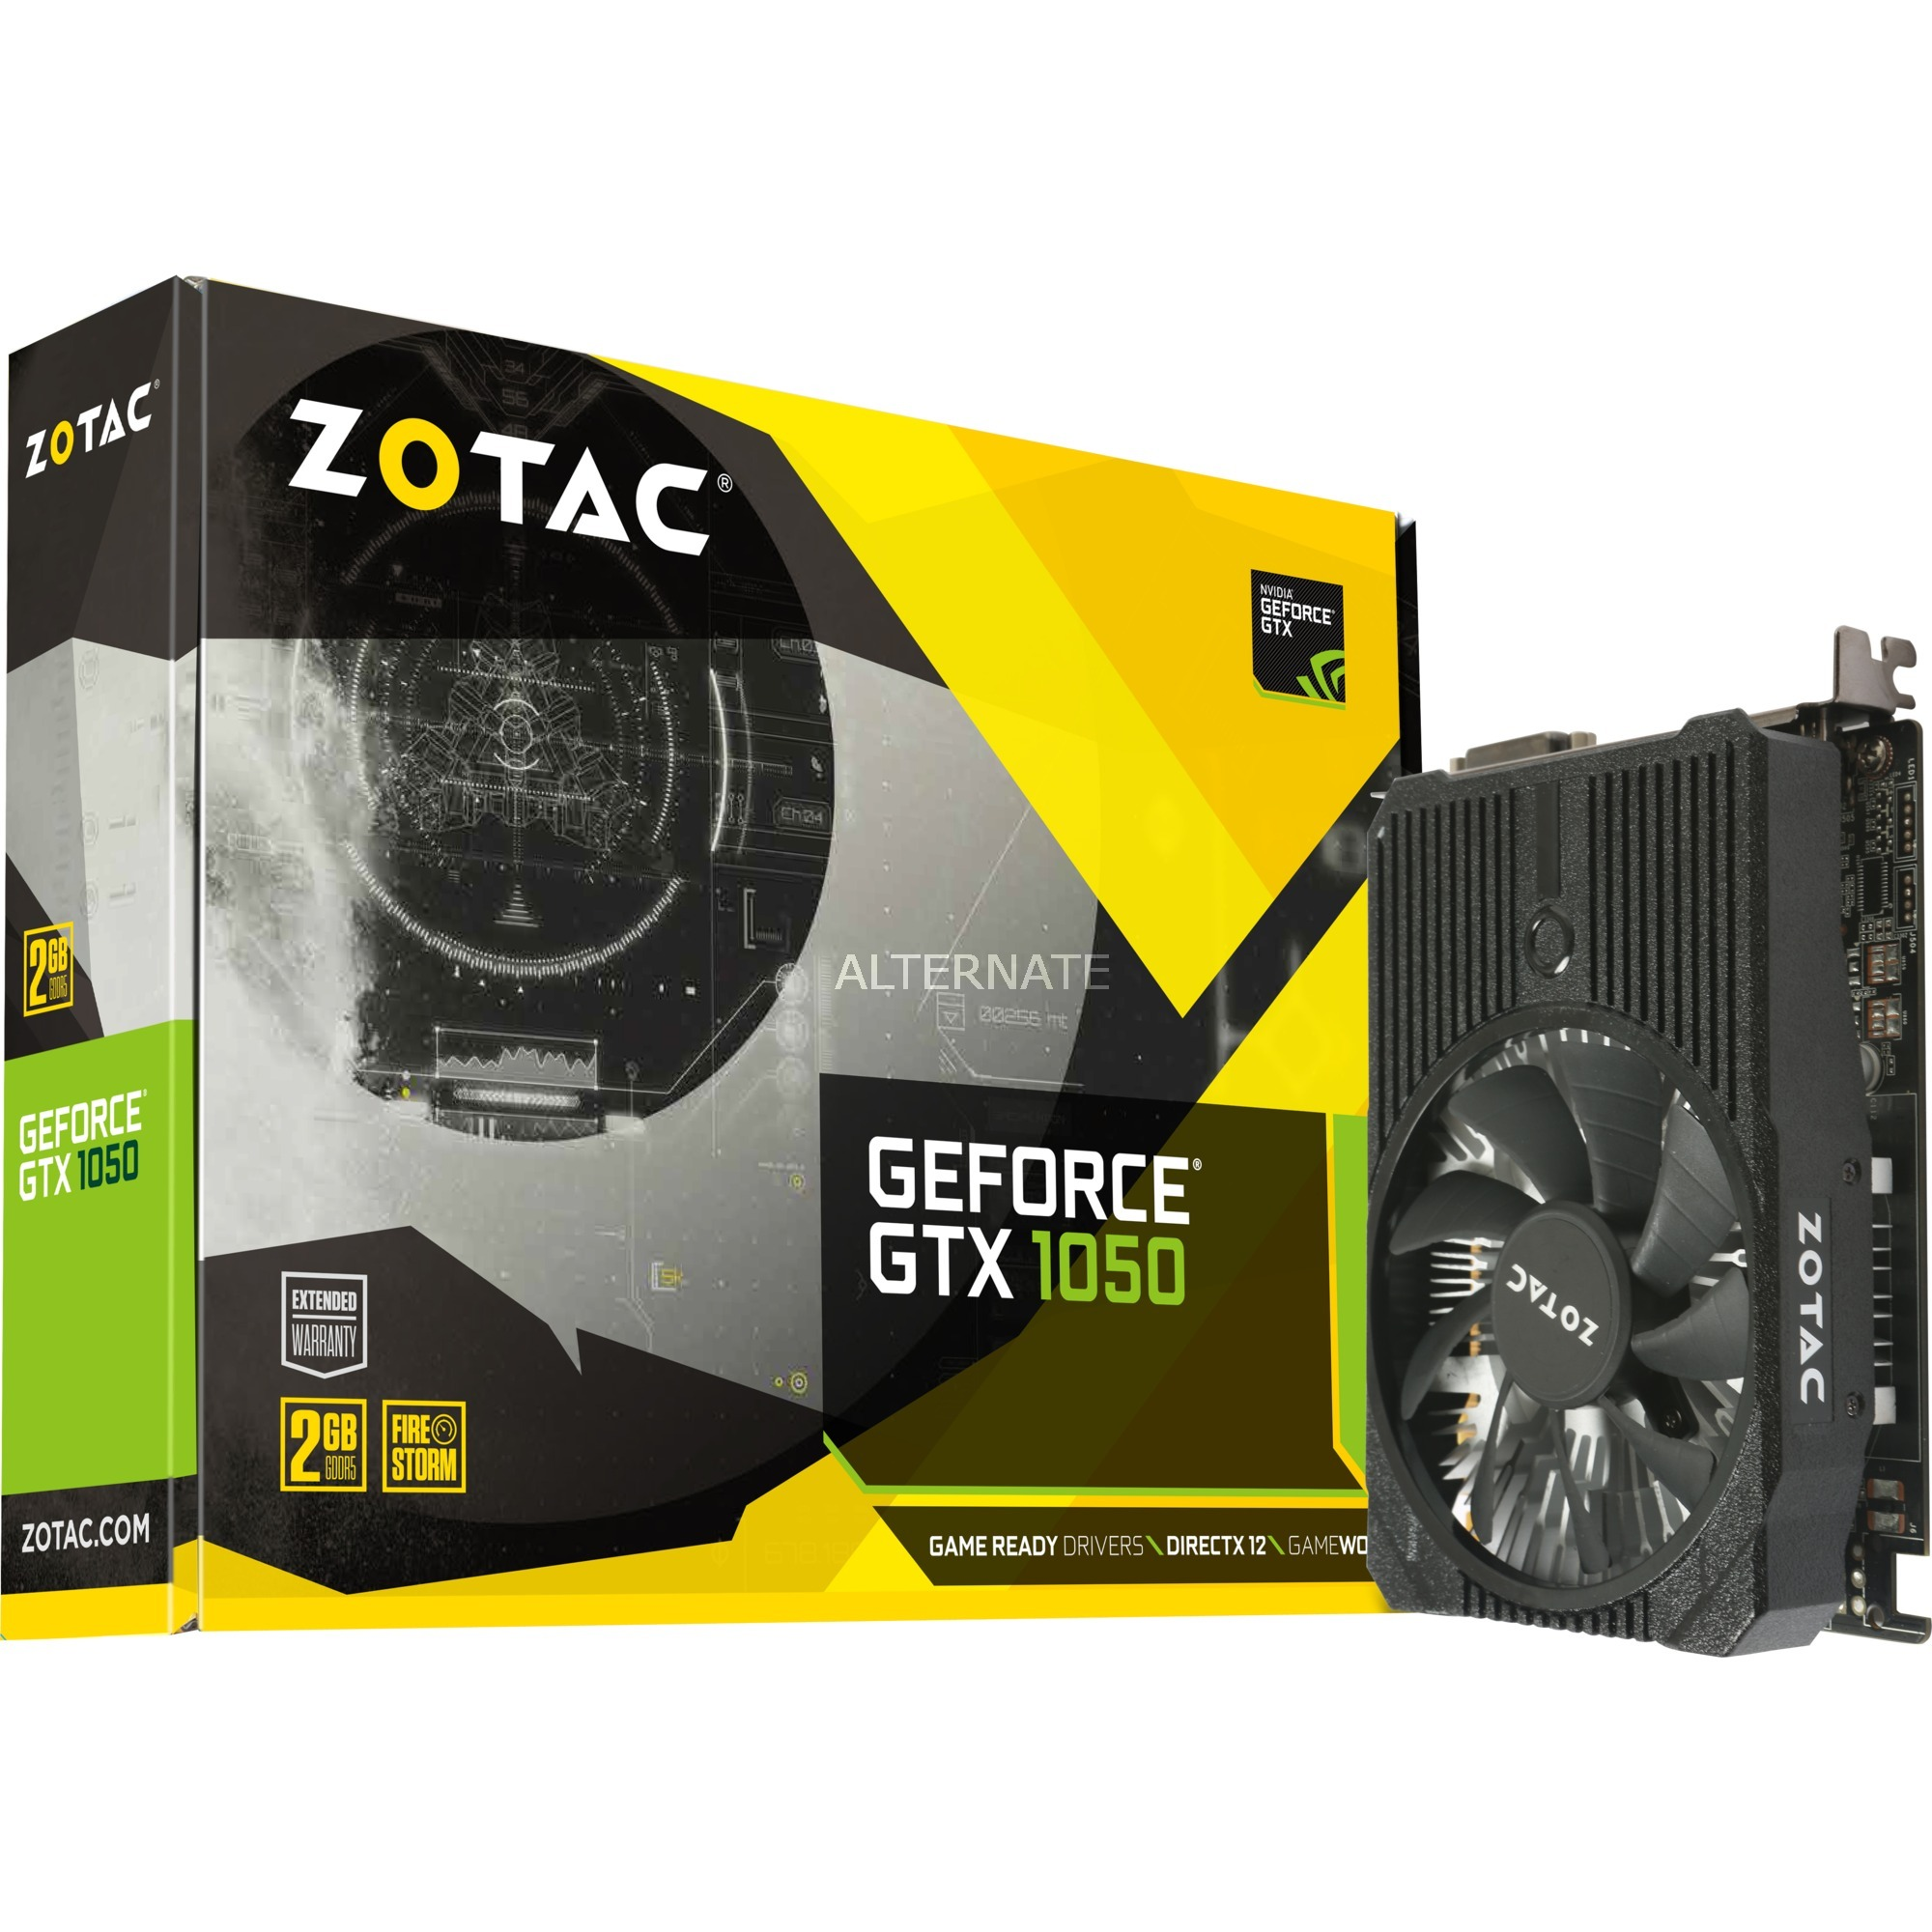 GeForce GTX 1050 Mini GeForce GTX 1050 2GB GDDR5, Tarjeta gráfica